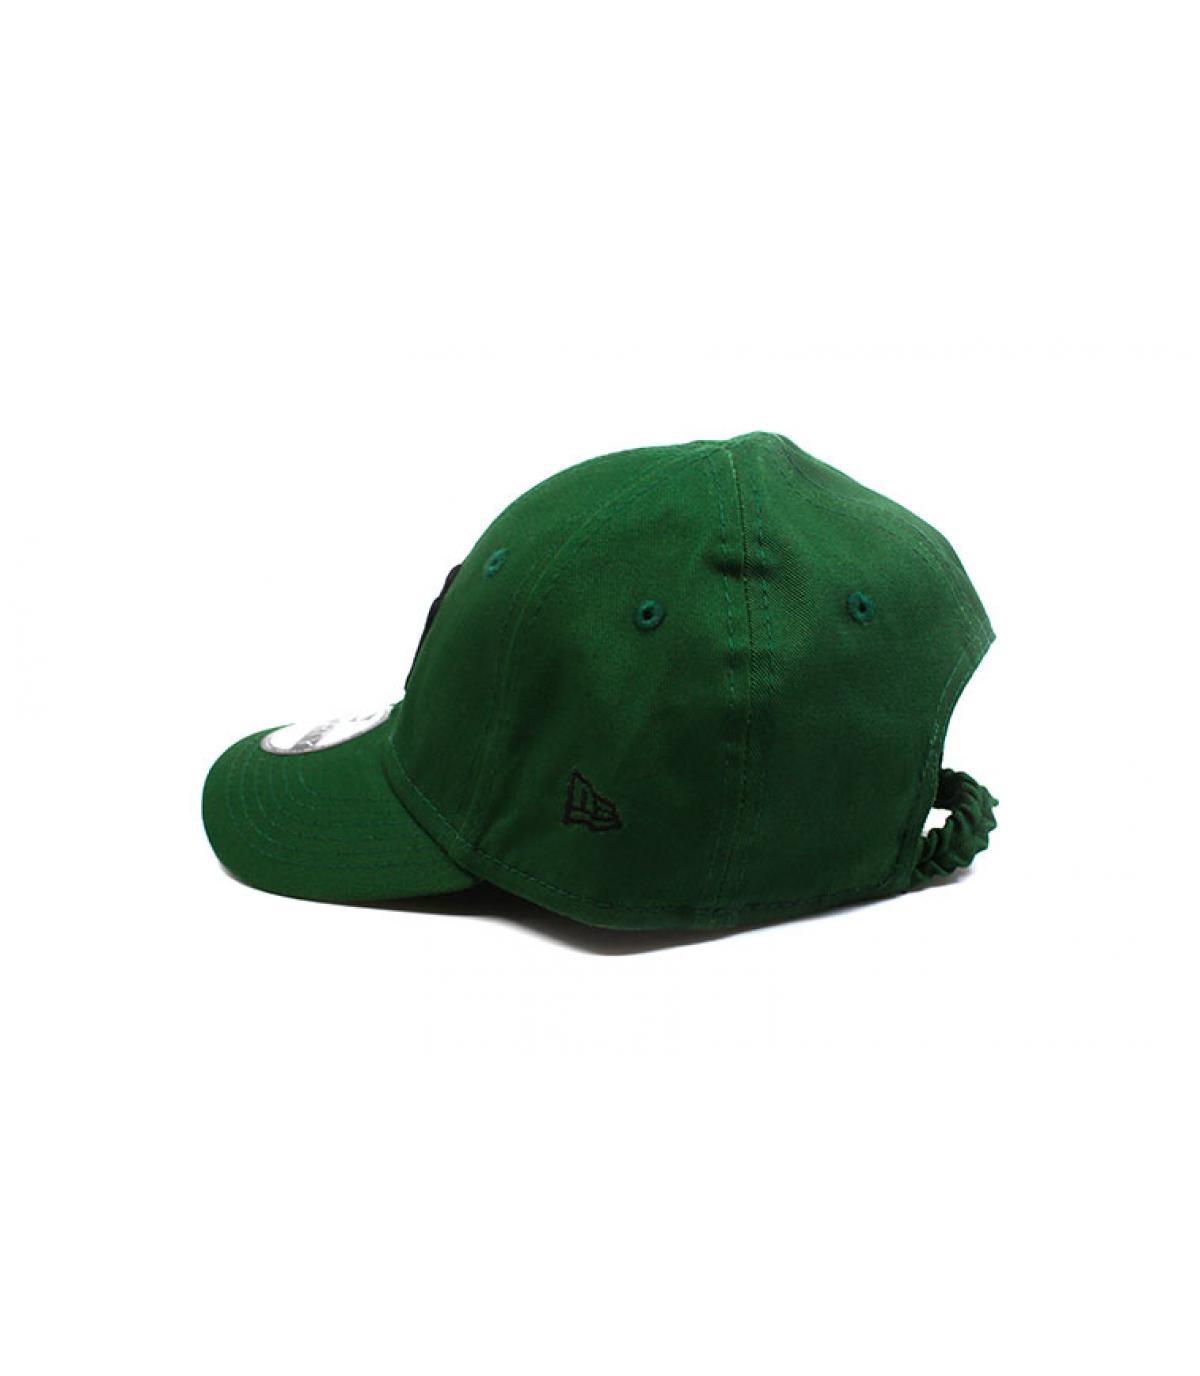 Details Baby Cap League Ess NY green black - Abbildung 4